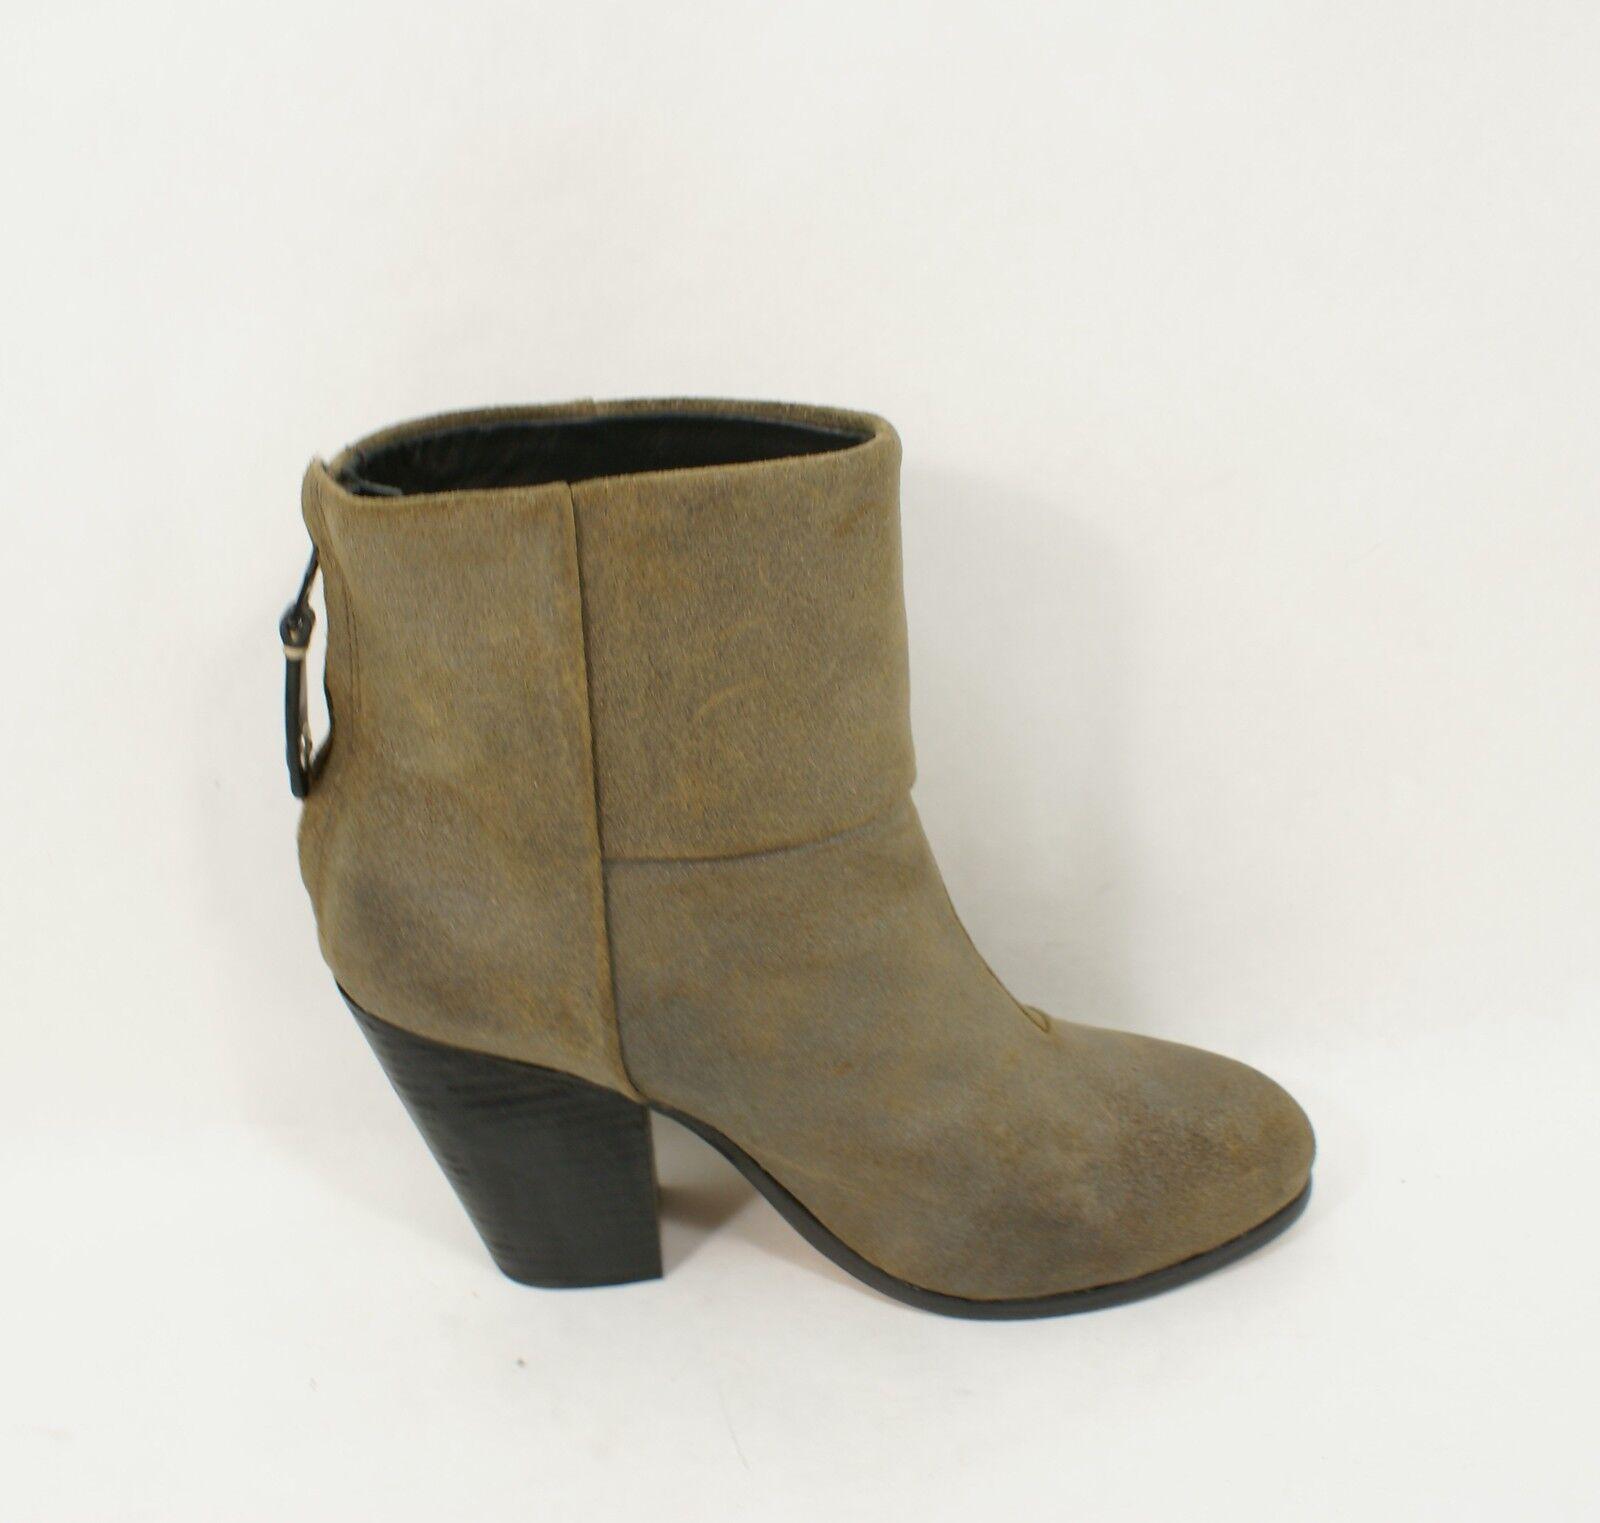 $525 Rag & Bone Newbury Metallic Stone Boot Oil Rubbed Suede Ankle Boot Stone Size 6.5 de189a